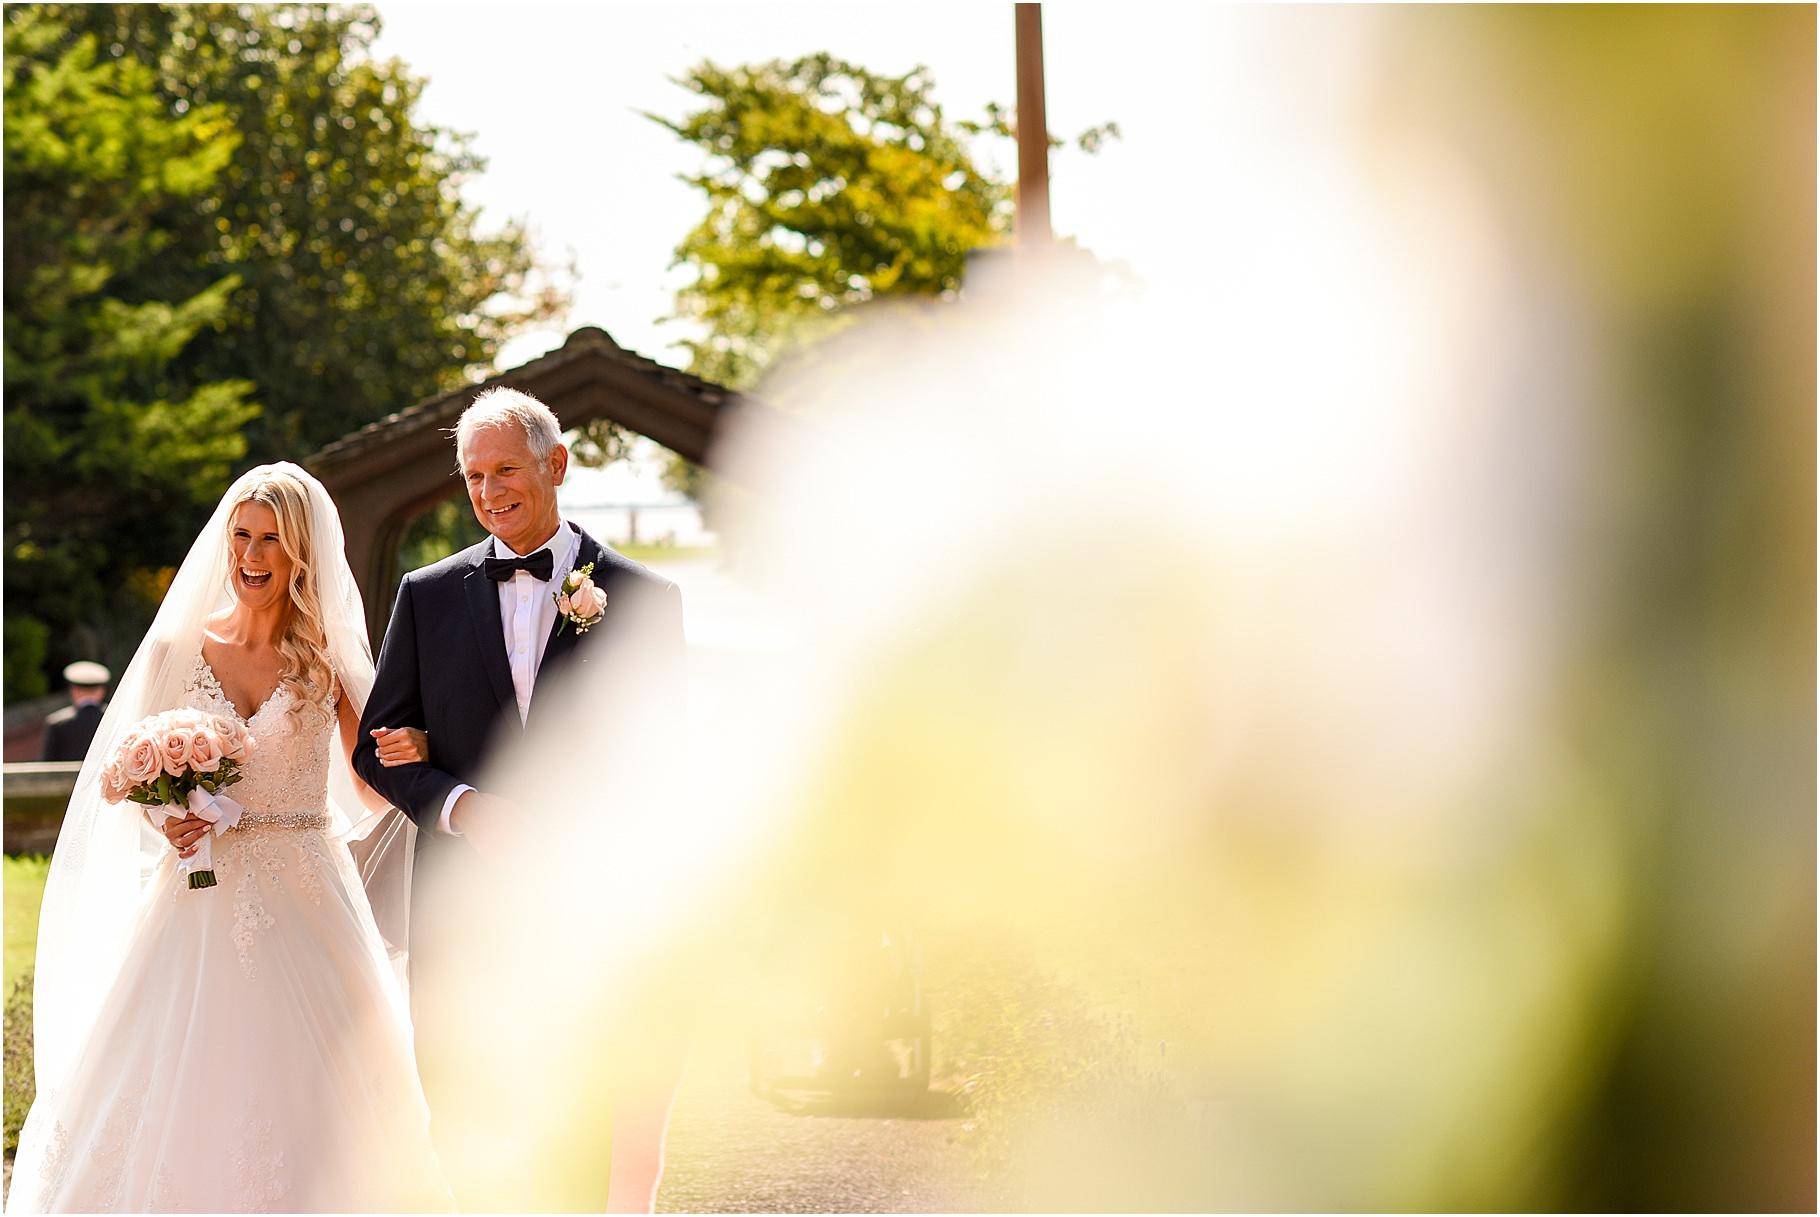 the-villa-wrea-green-wedding-23.jpg